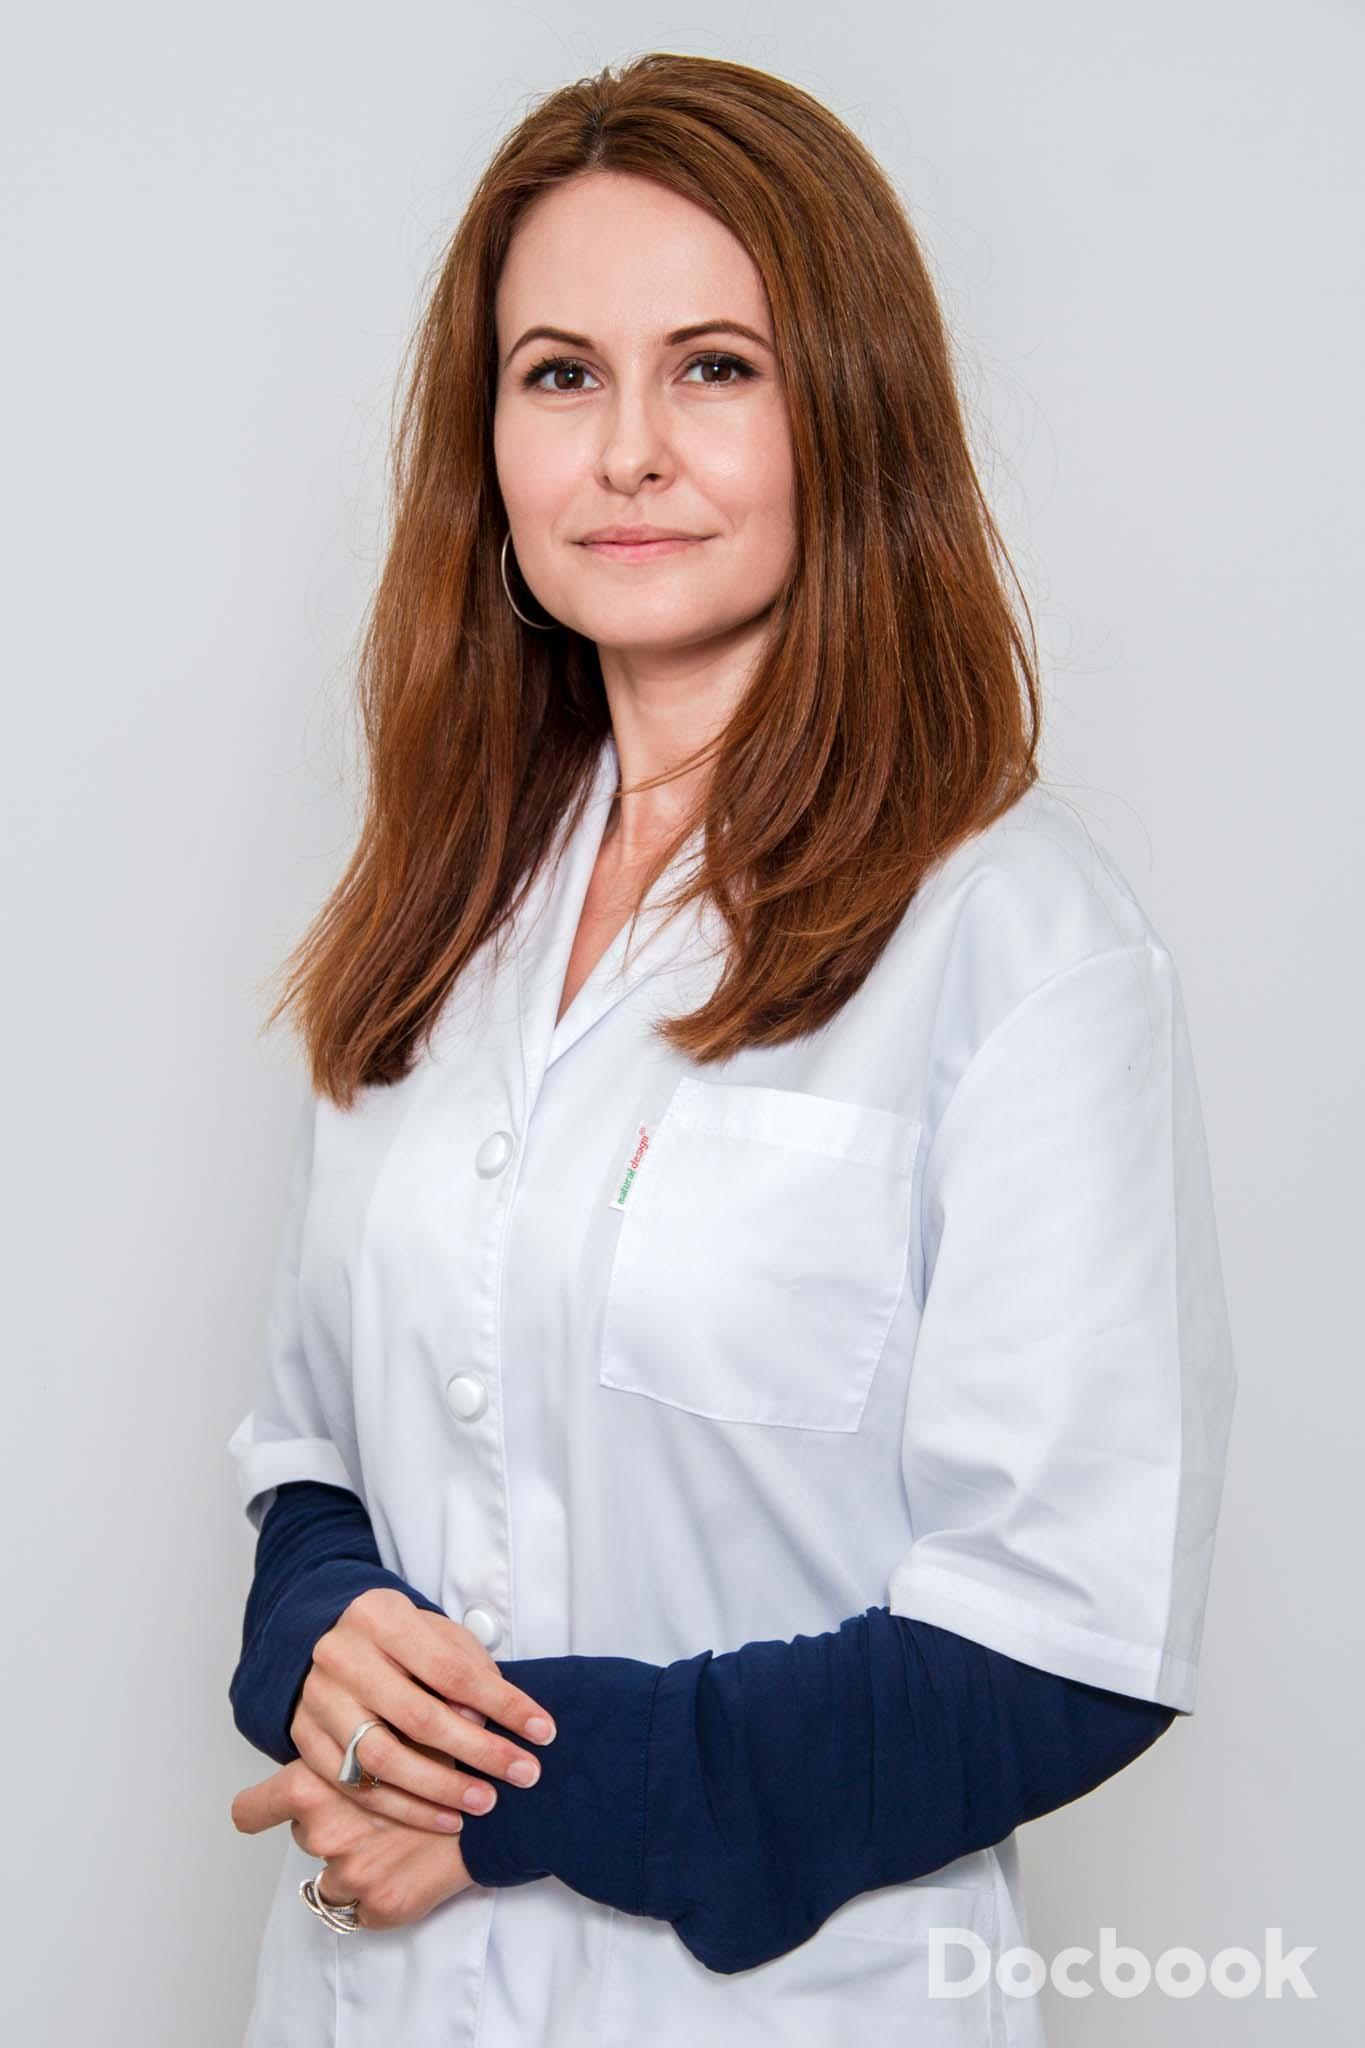 Dr. Luciana Claudia Angelescu